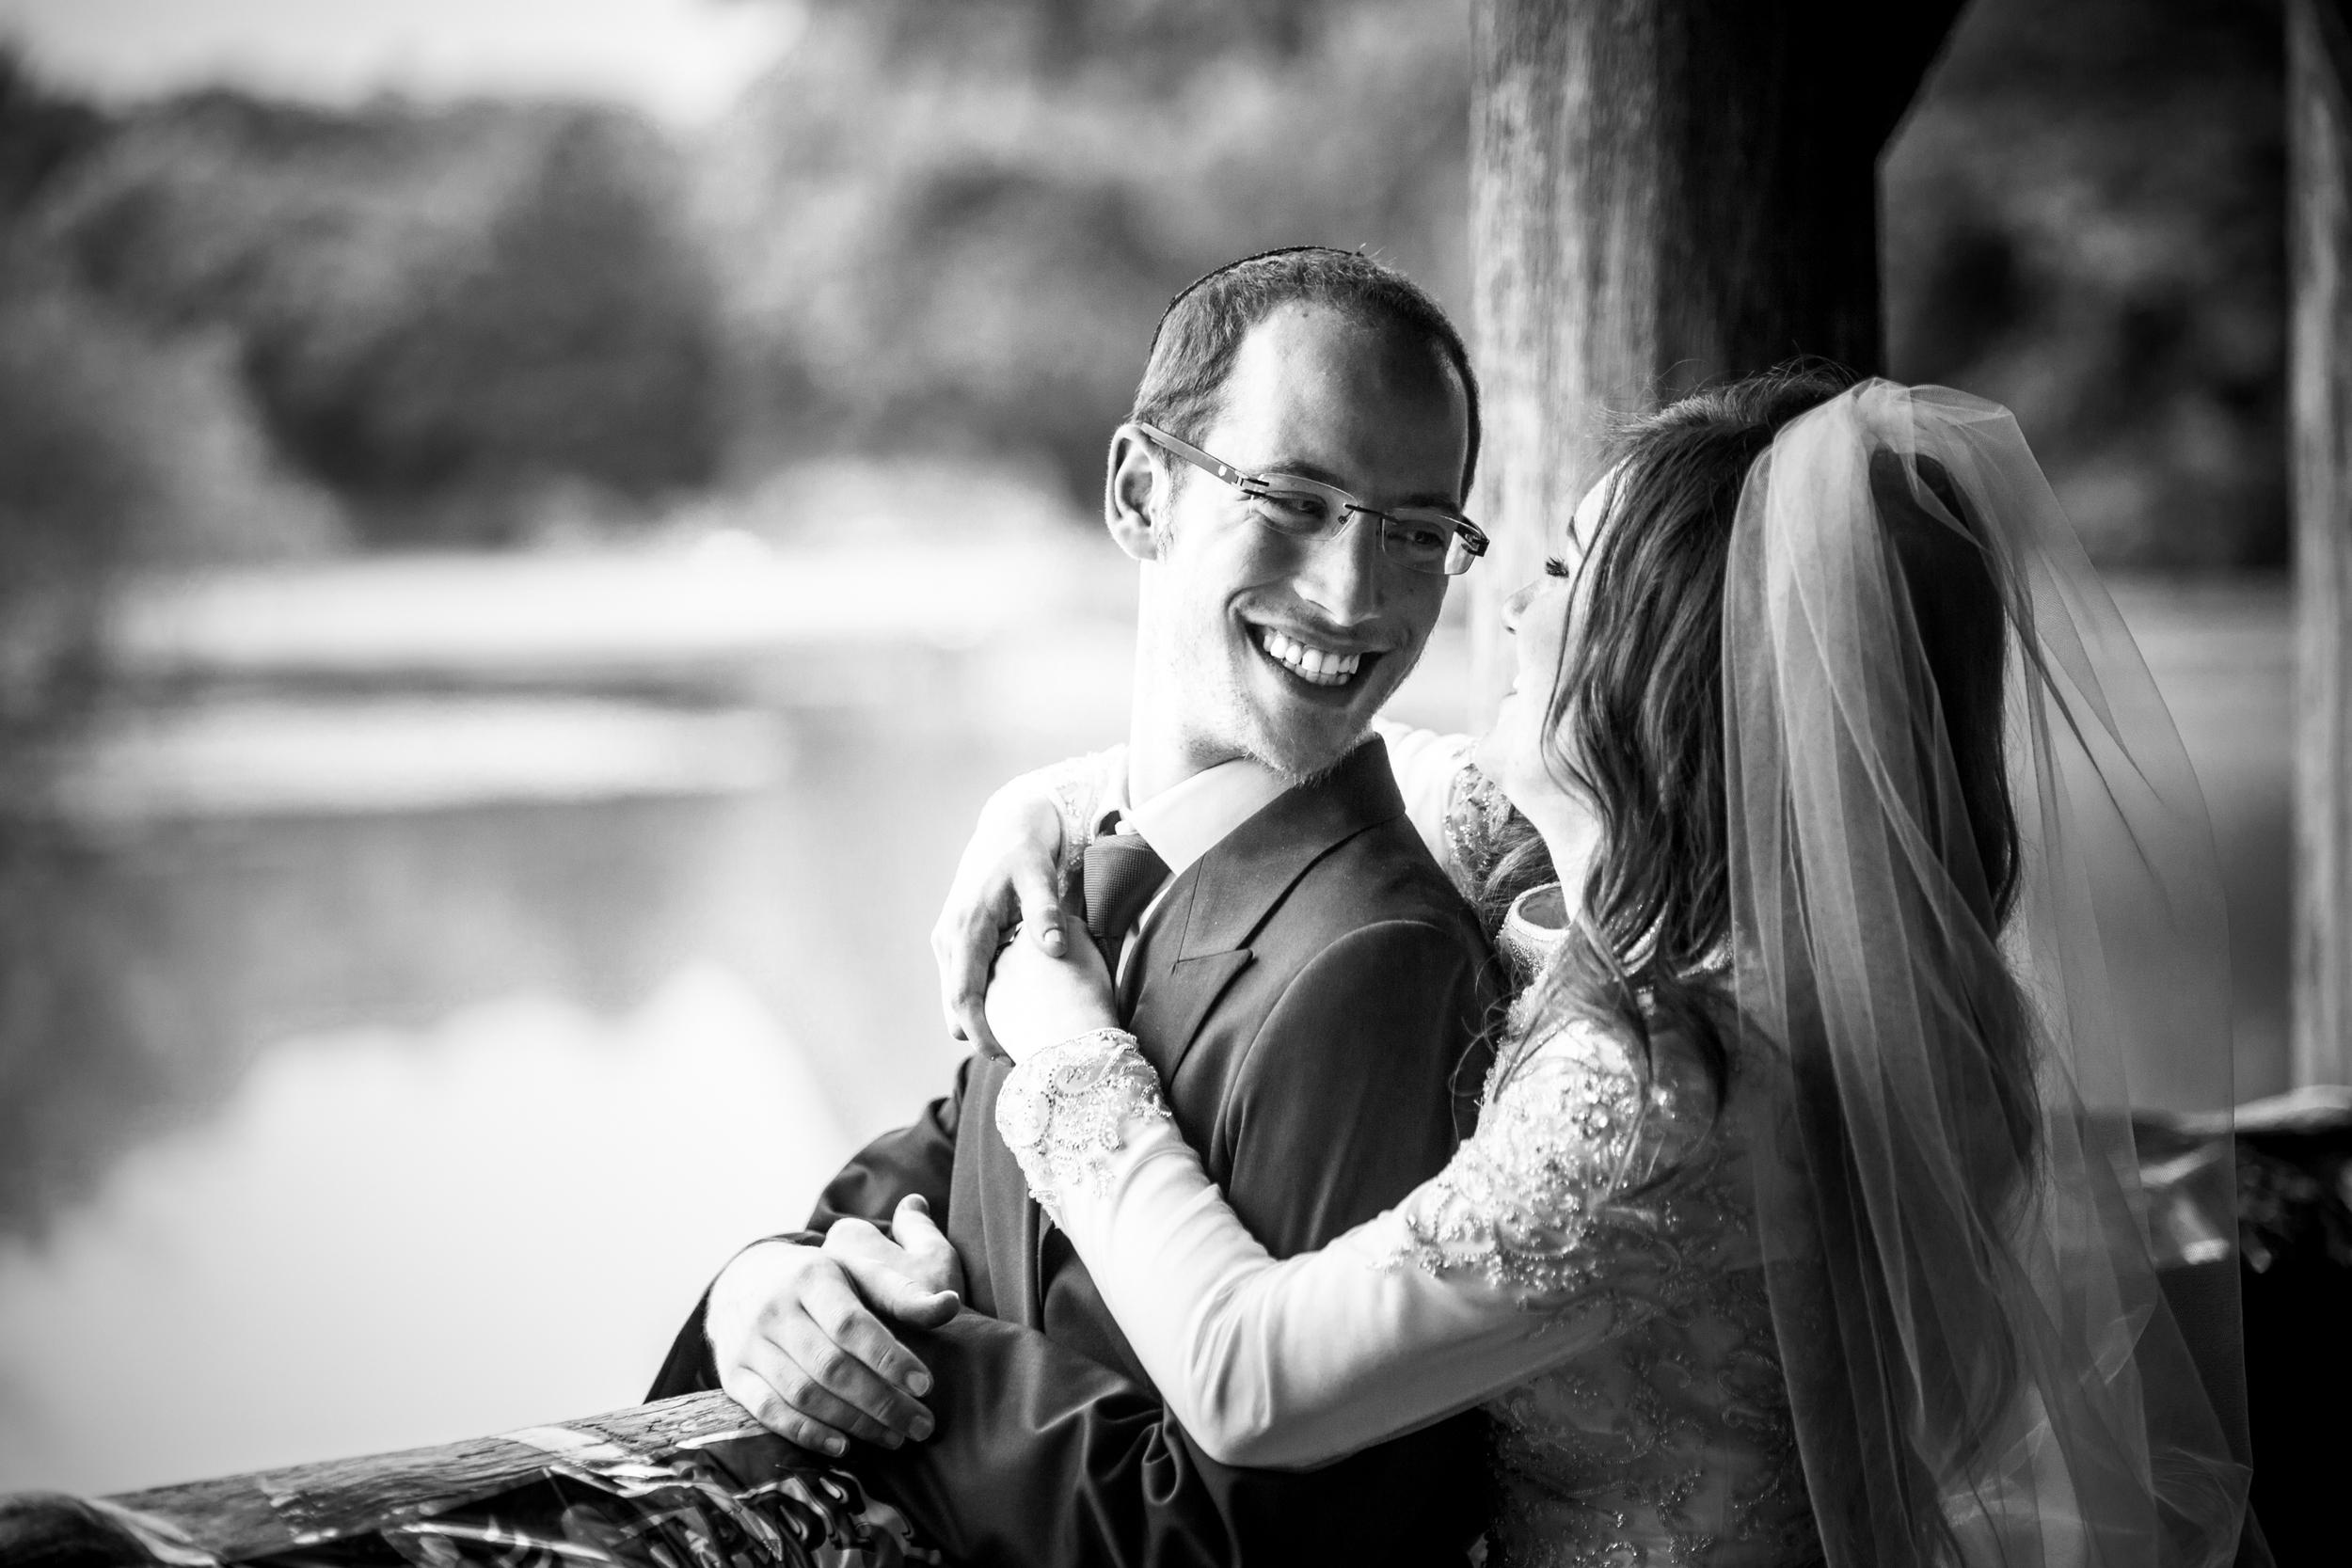 Wedding Iossi and Gitty Khafif  - Eliau Piha studio photography, new york, events, people 770 brooklyn -0670.jpg